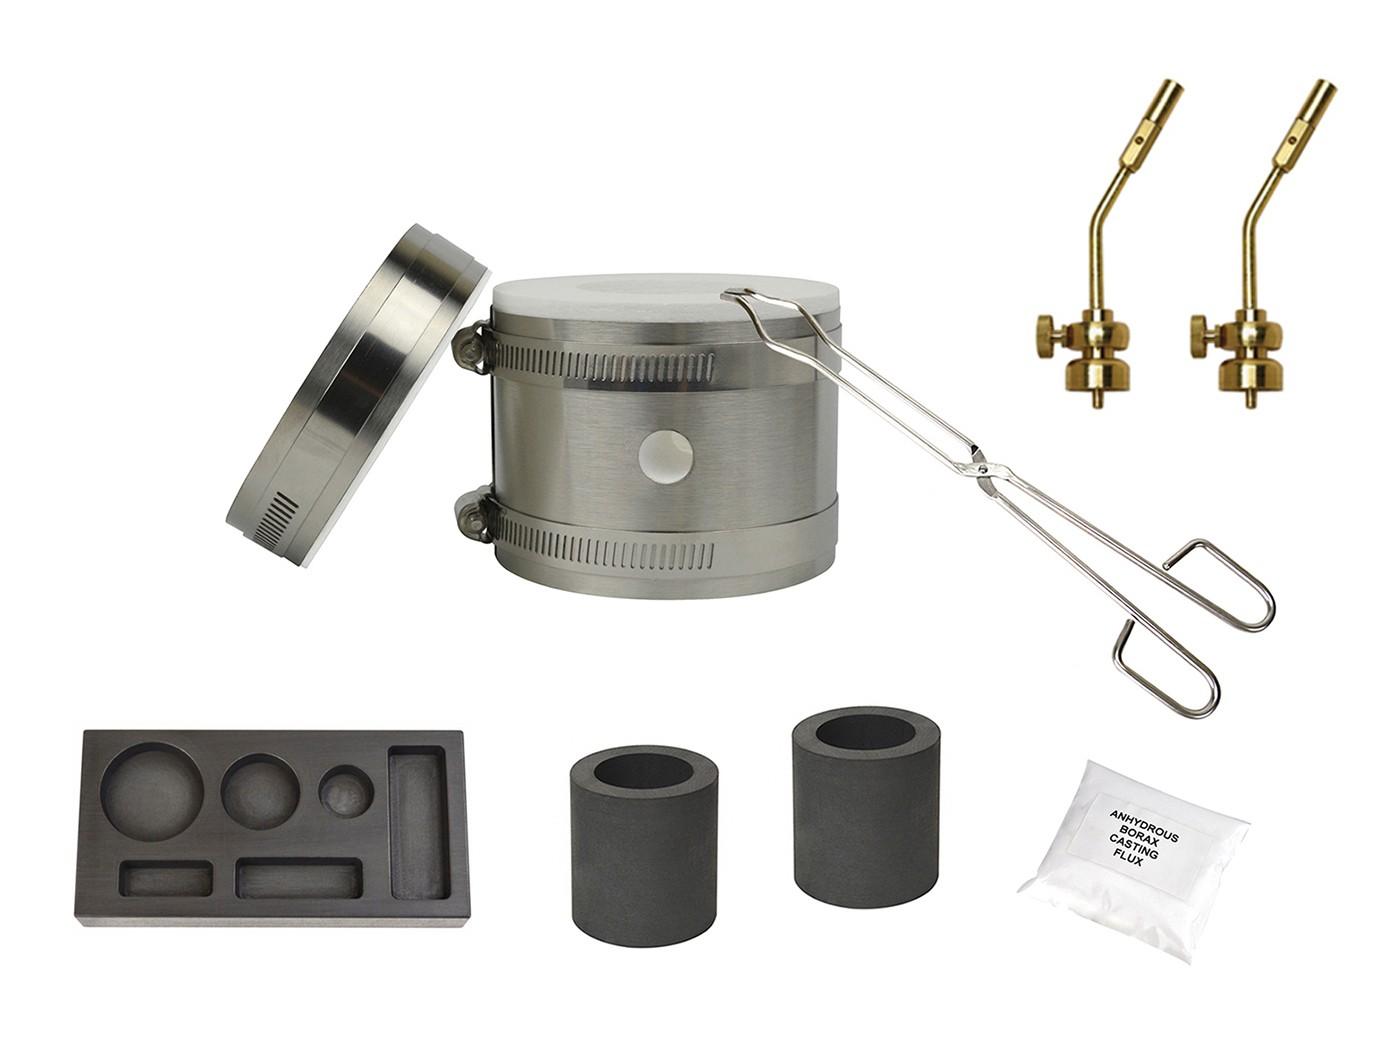 Deluxe Mini Kwik Kiln Propane Furnace w/ 6 Cavity (1/4, 1/2, and 1 oz) Mold and Brass Propane Bottle Tips